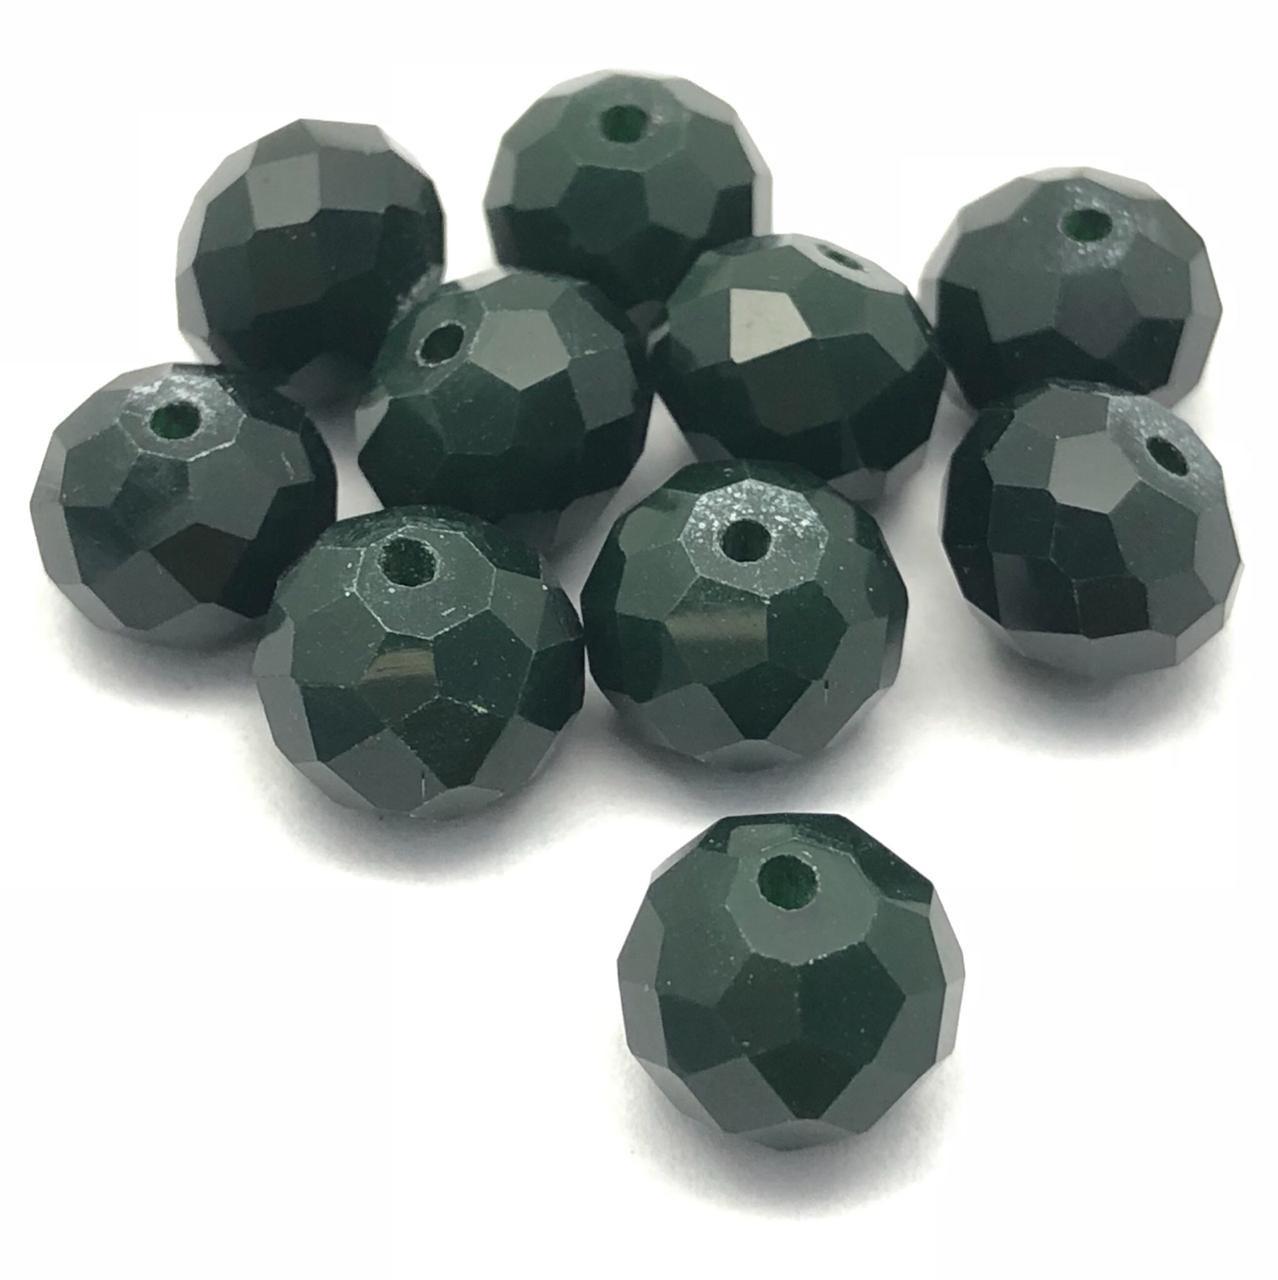 CRT420 - Cristal no Fio Verde Pasto 10mm - 72Unid